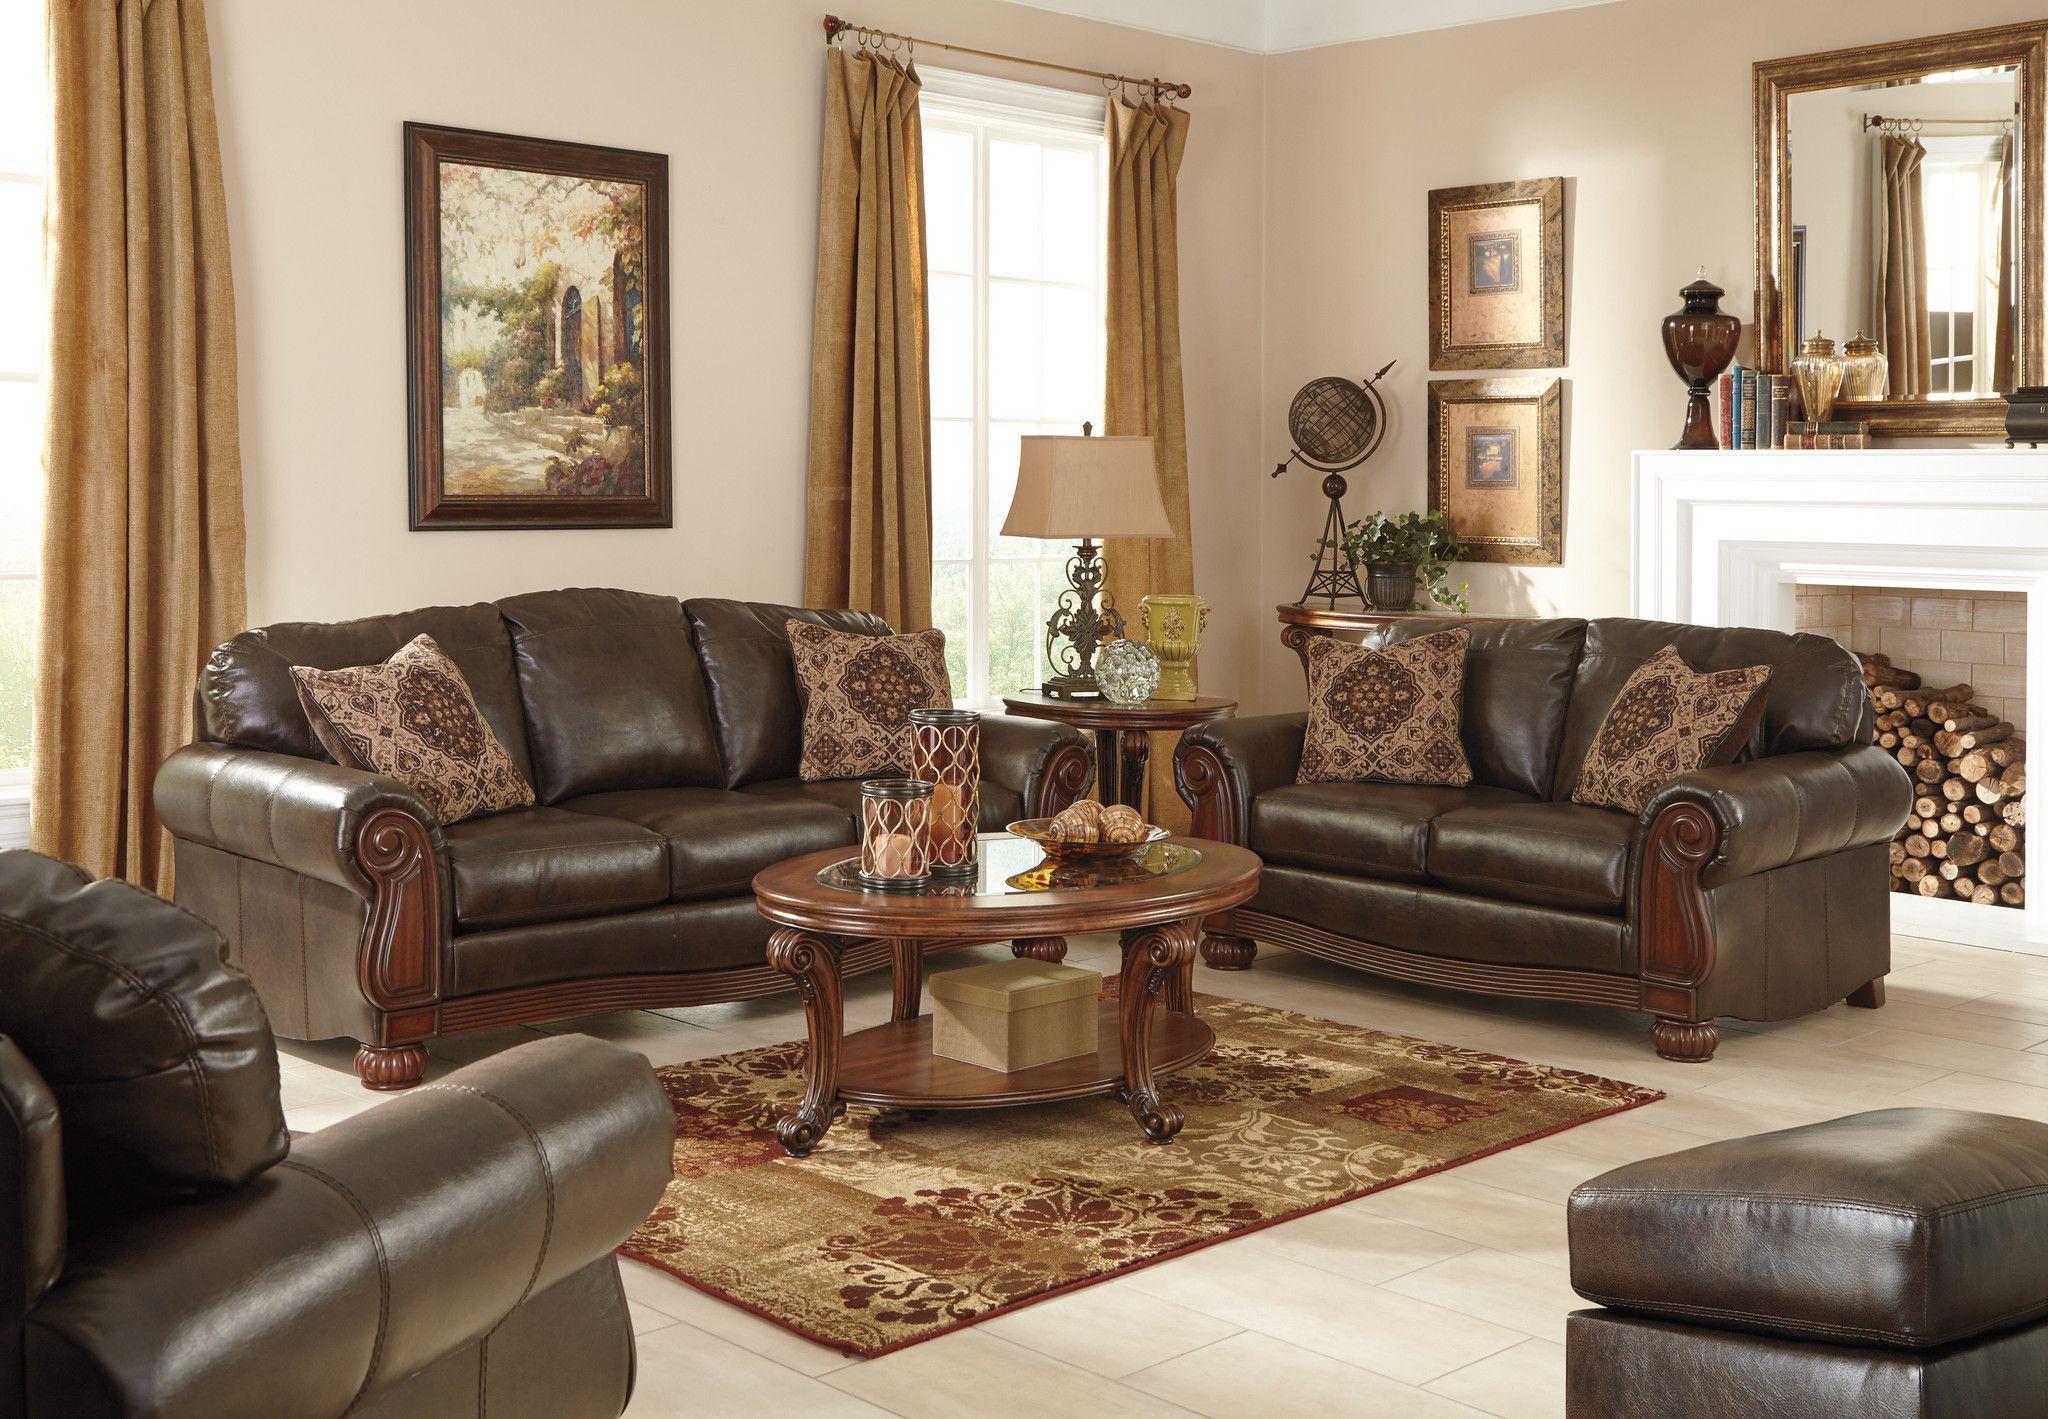 Rodlann Bonded Leather Sofa Loveseat